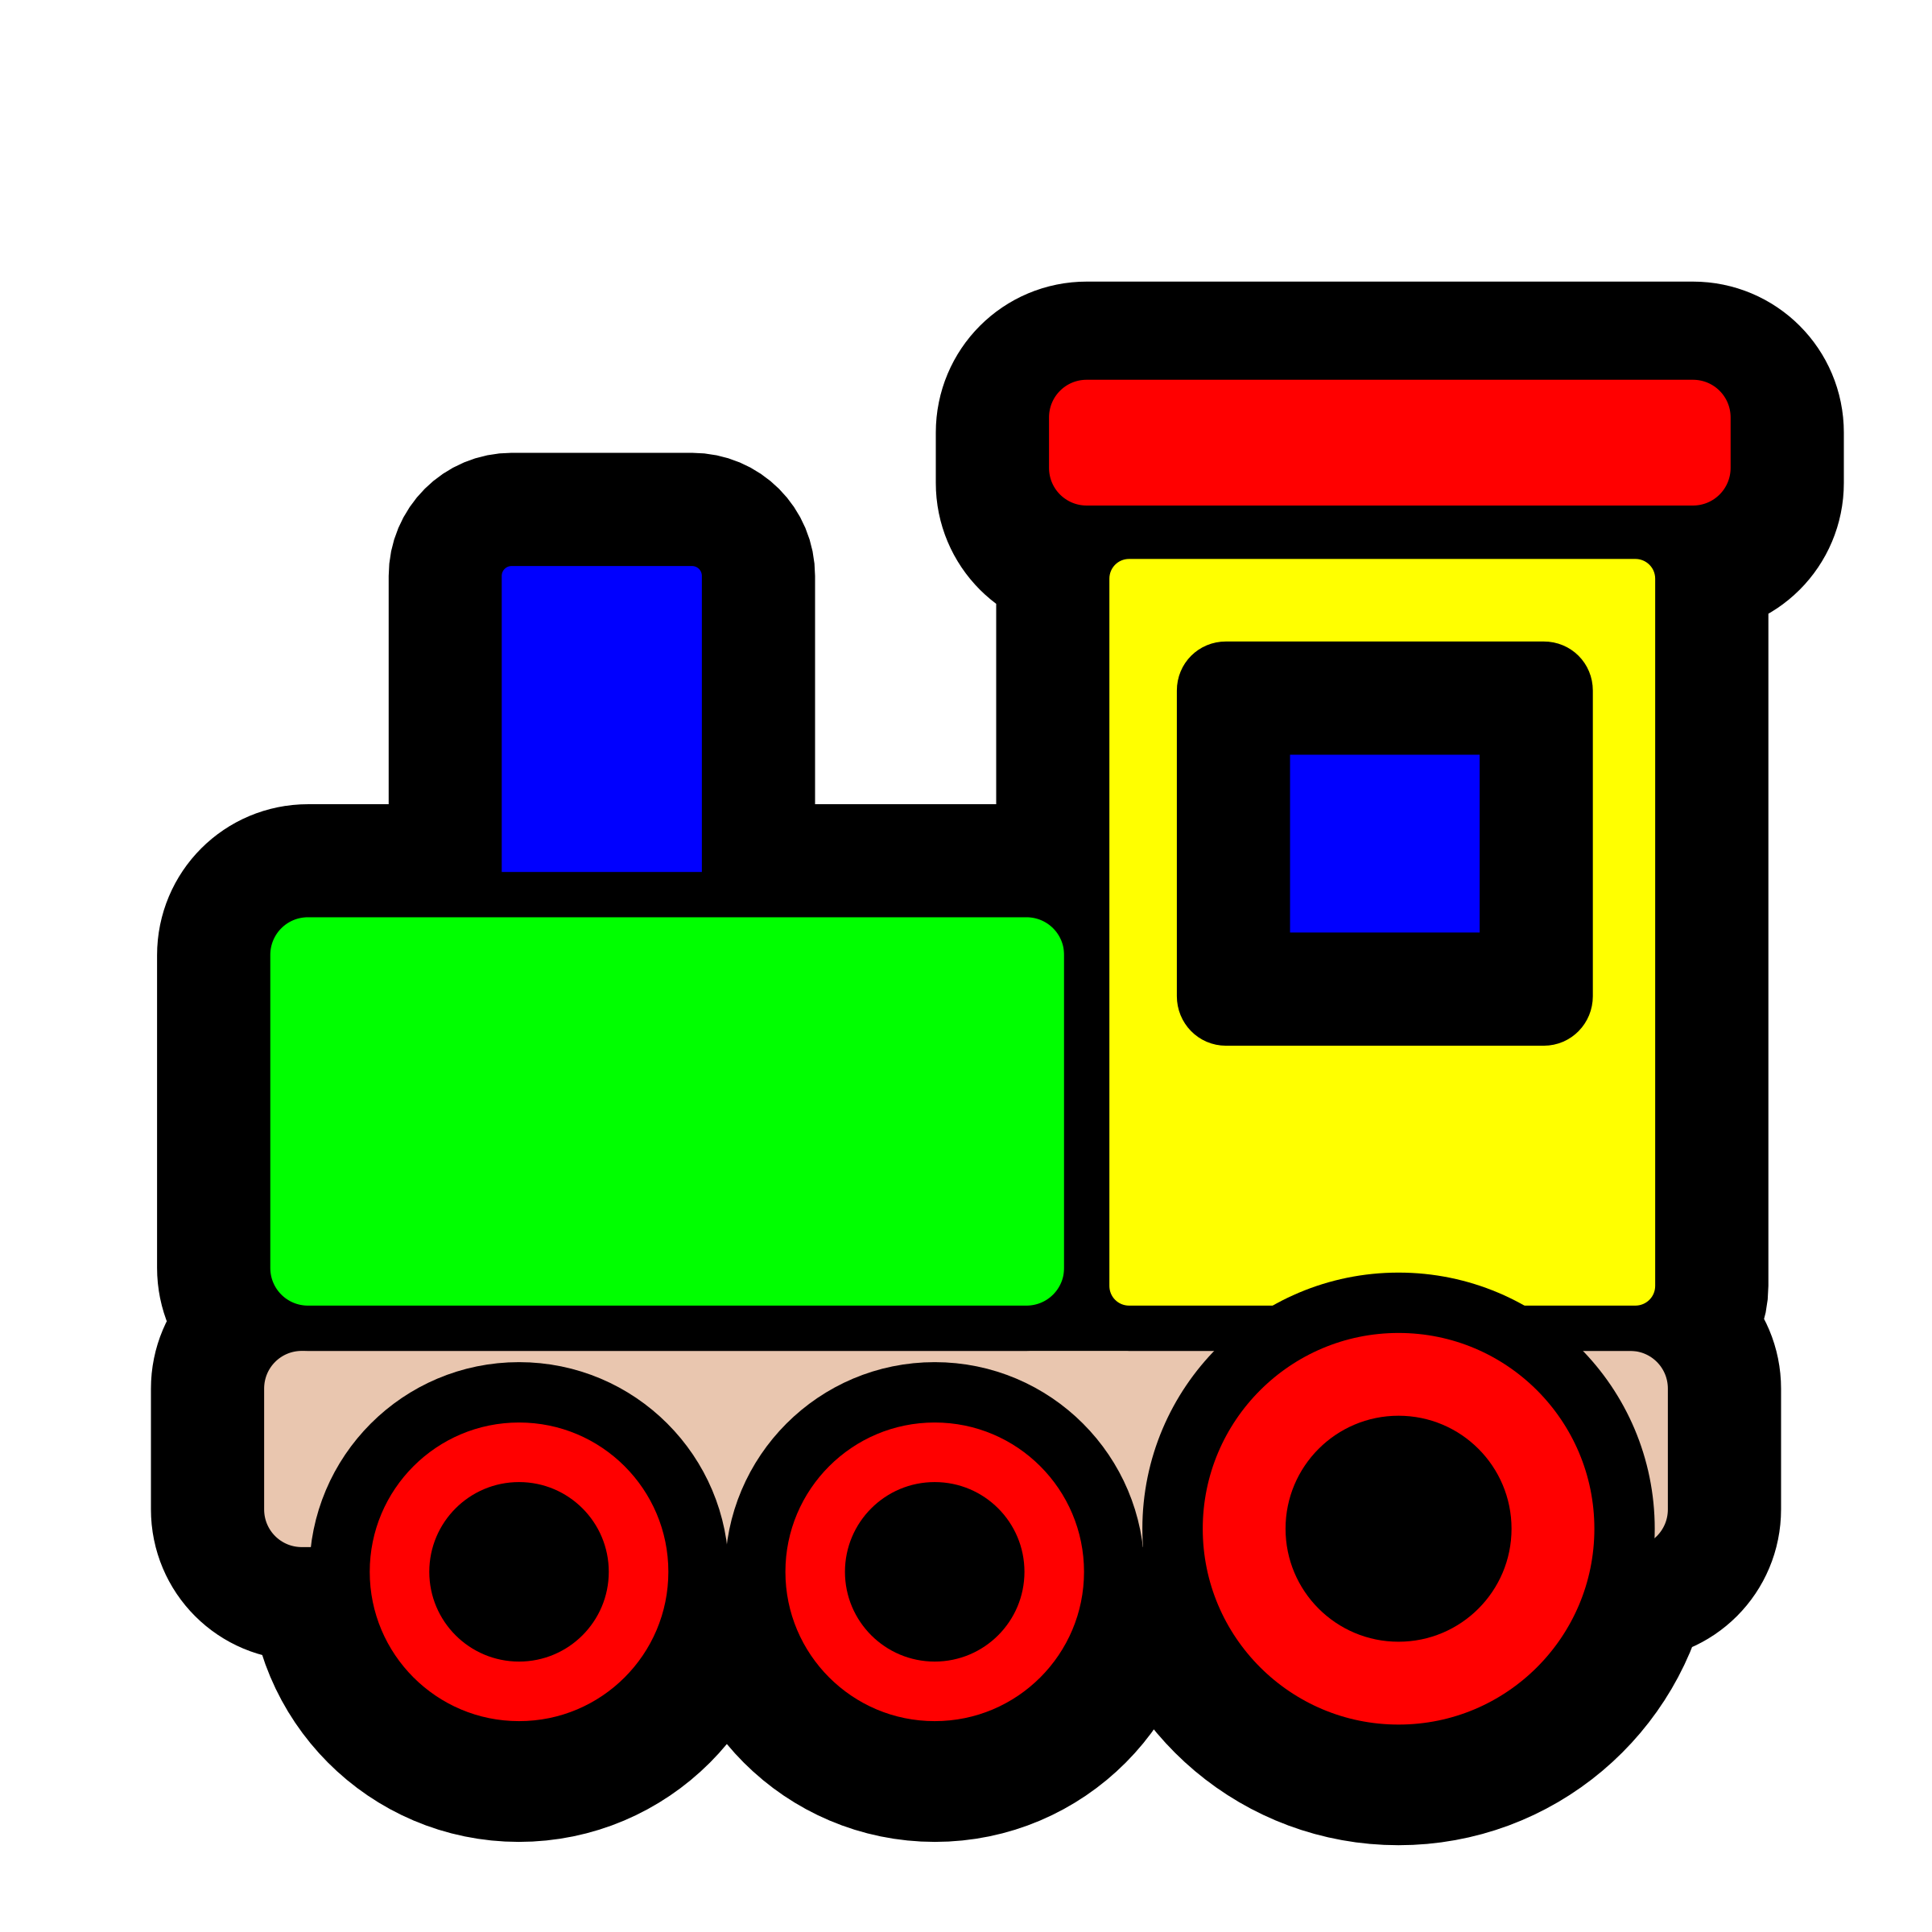 2400x2400 Wooden Train Clipart Amp Wooden Train Clip Art Images